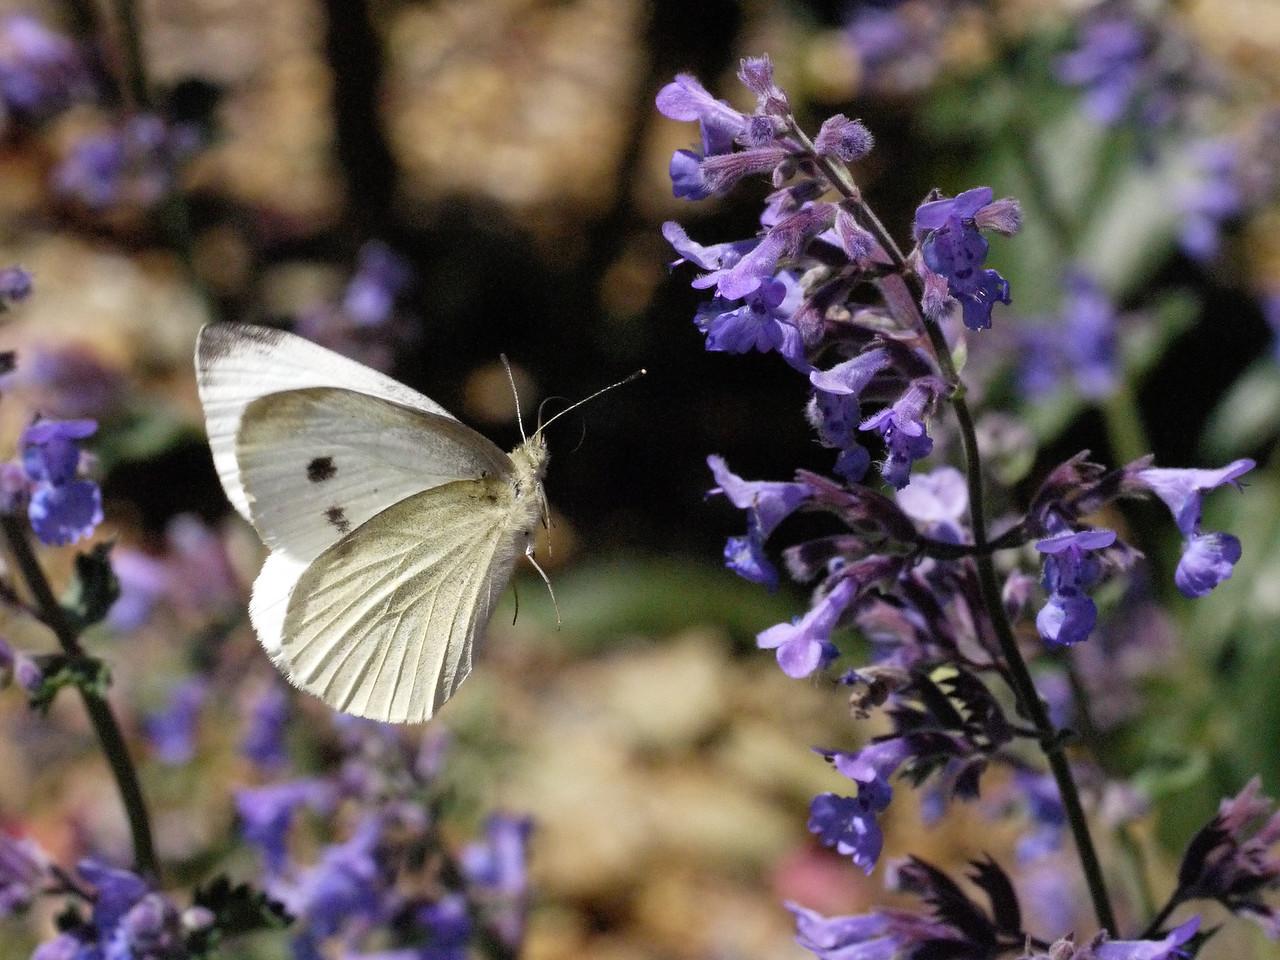 20131105_1054_0097 butterfly (Ivanhoe Park)